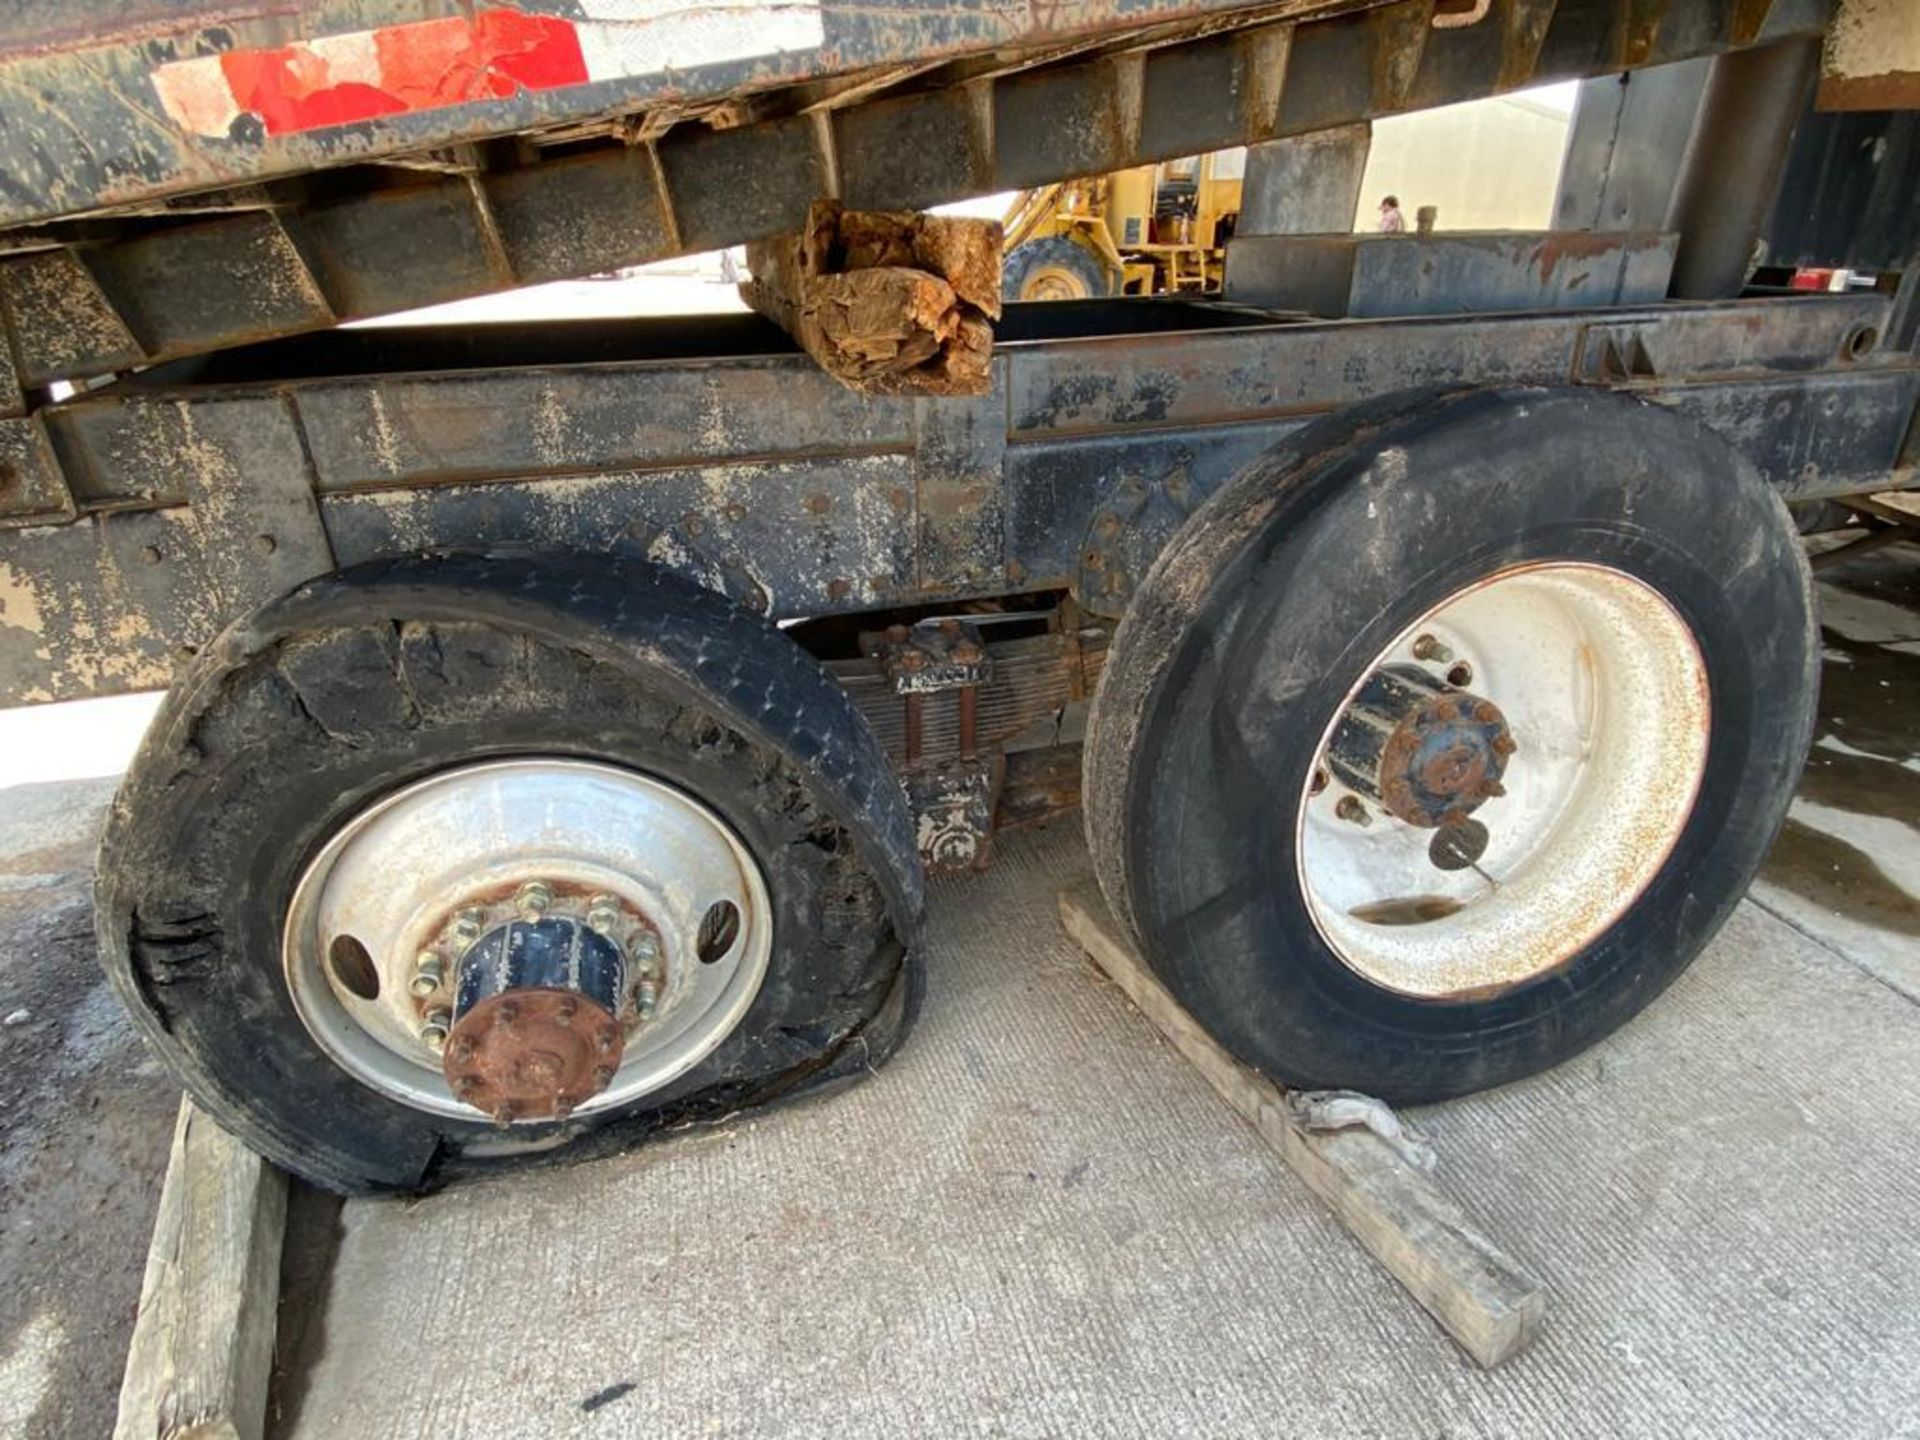 1983 Kenworth Dump Truck, standard transmission of 10 speeds, with Cummins motor - Image 54 of 68